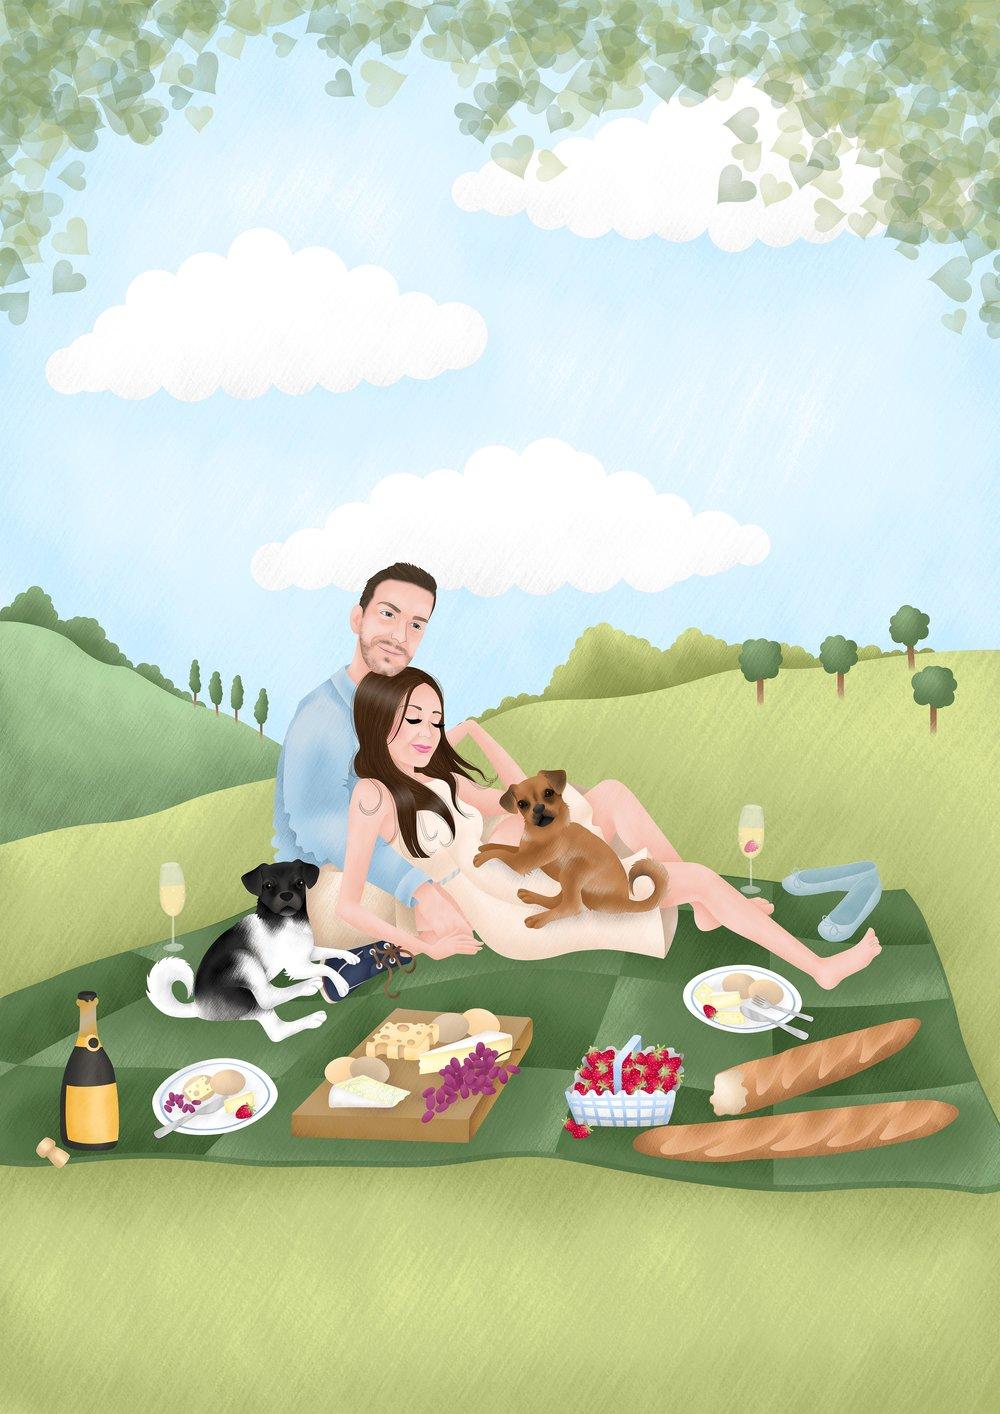 Hannah-Weeks-Bespoke-Illustration-Wayne-Dalton-A3-270415.jpg